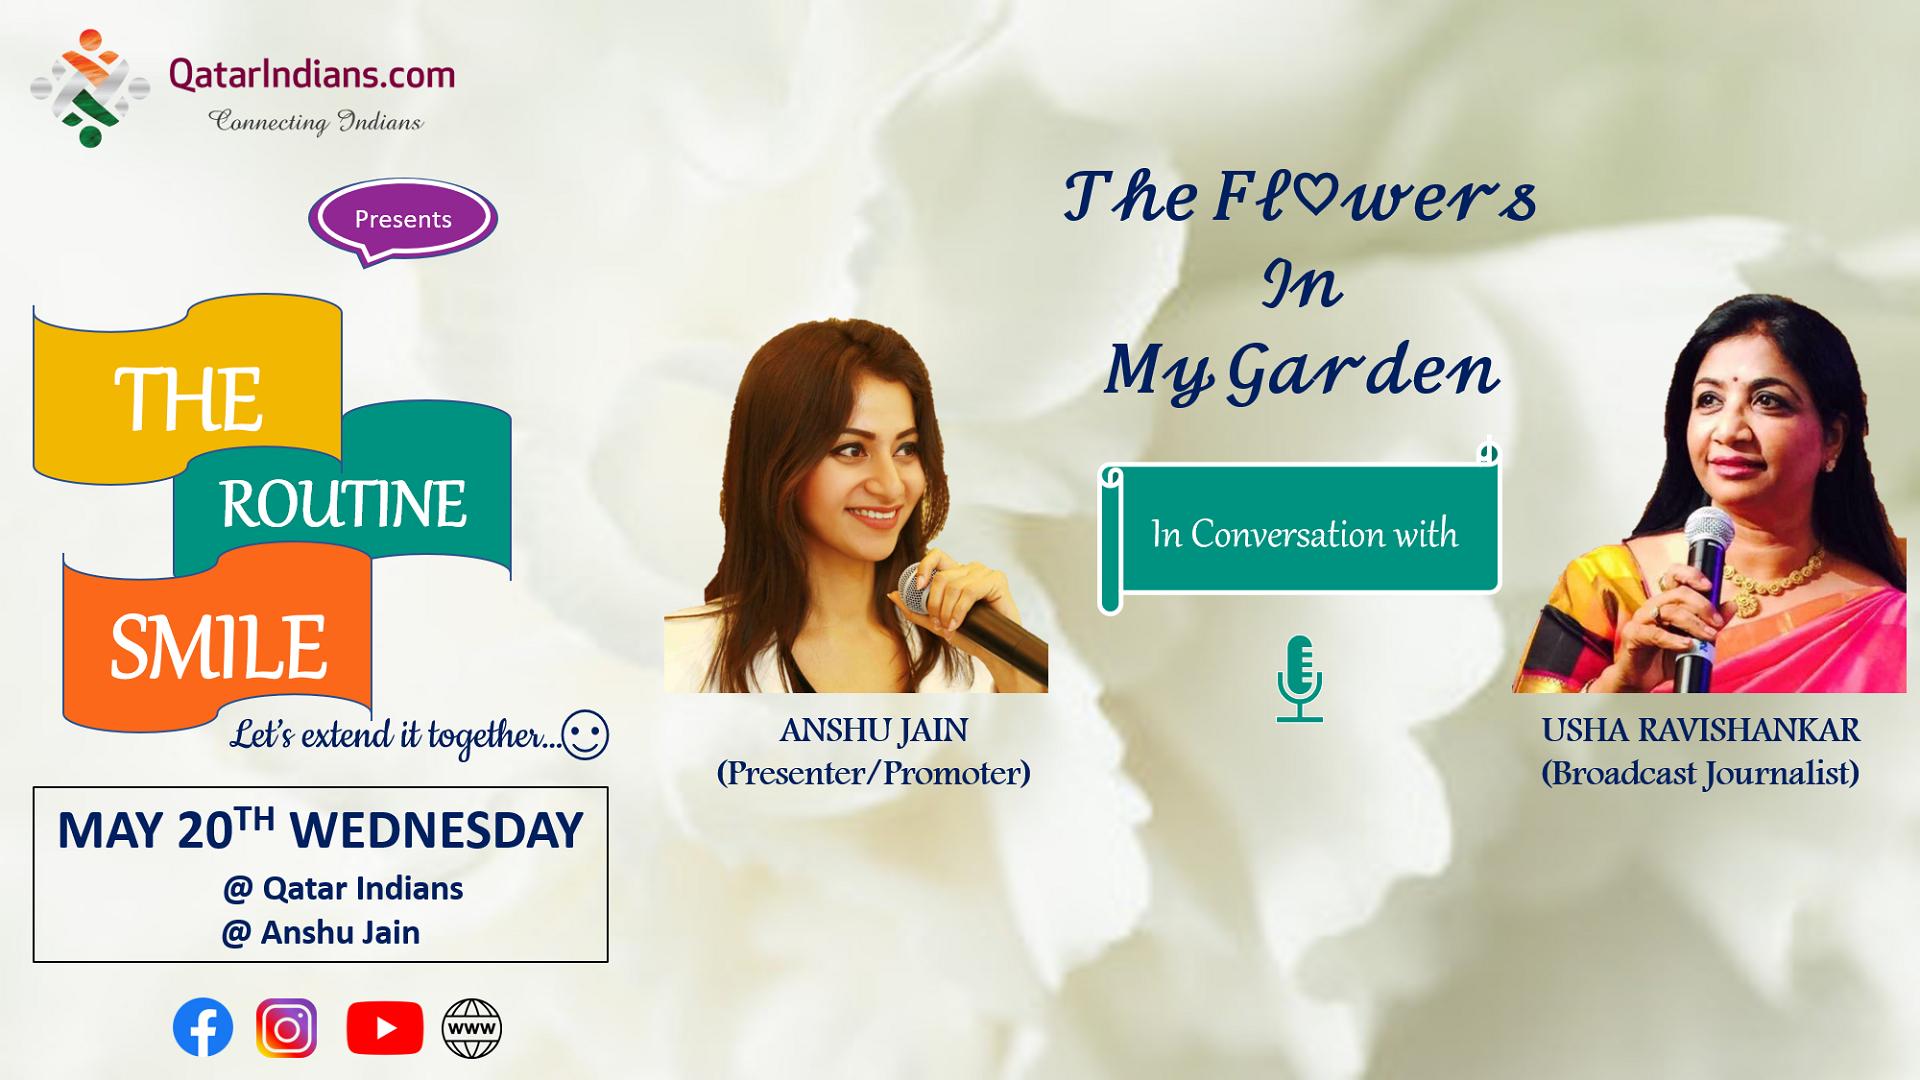 "Usha Ravishankar ""The Routine Smile"" - Anshu Jain in Conversation with Mrs. Usha Ravishankar, the champion communicator, powerful orator   QatarIndians.com"